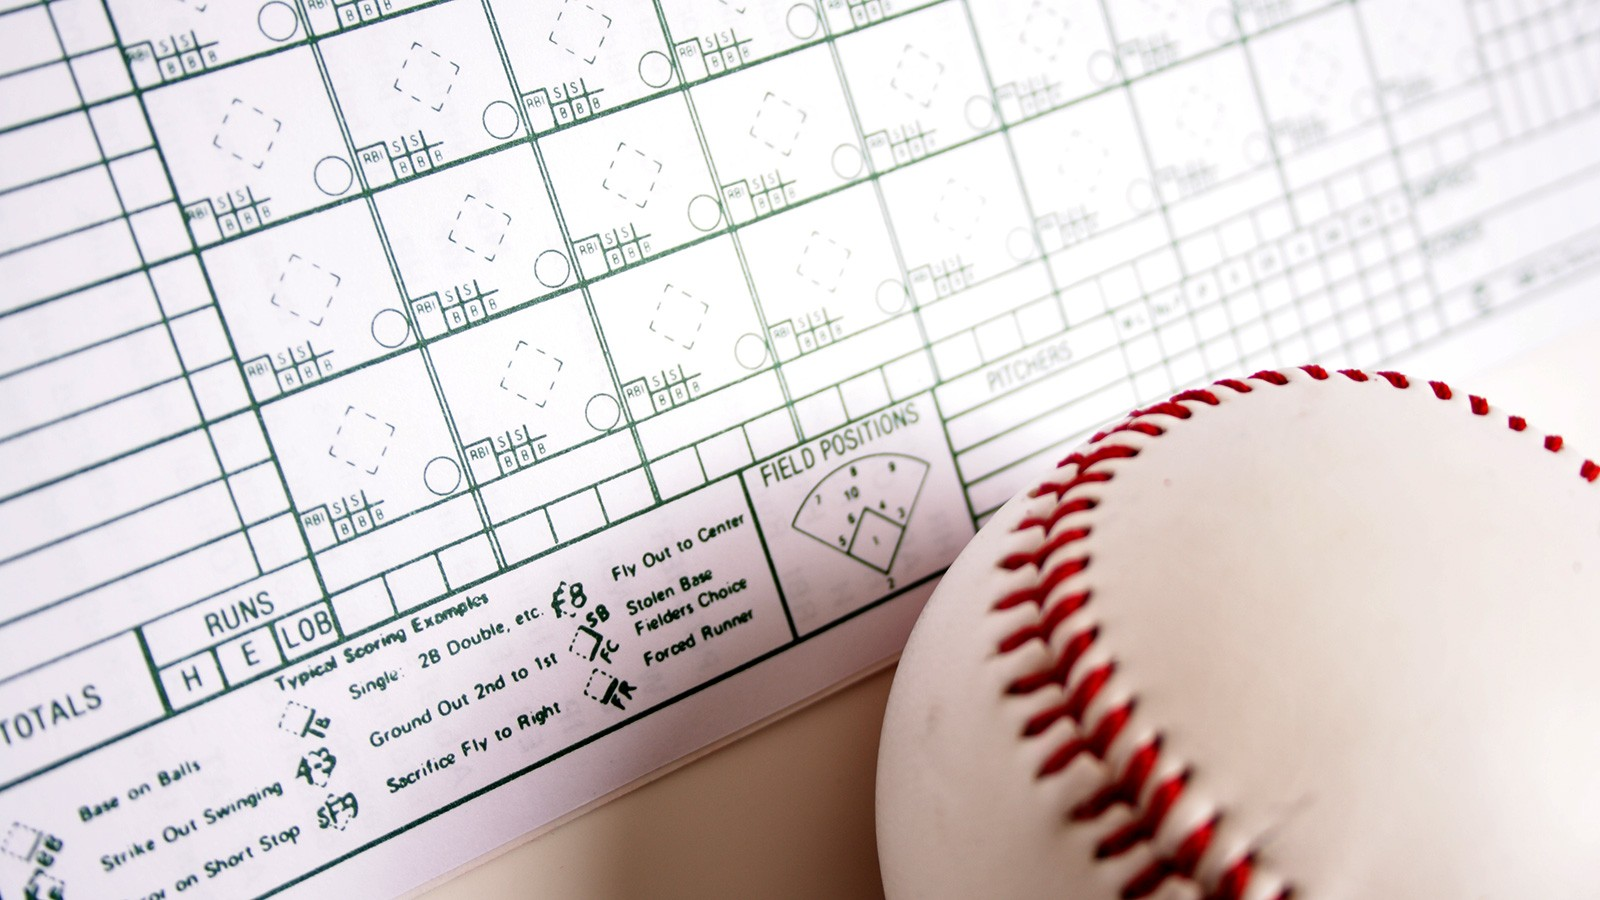 Baseball scorecard with baseball